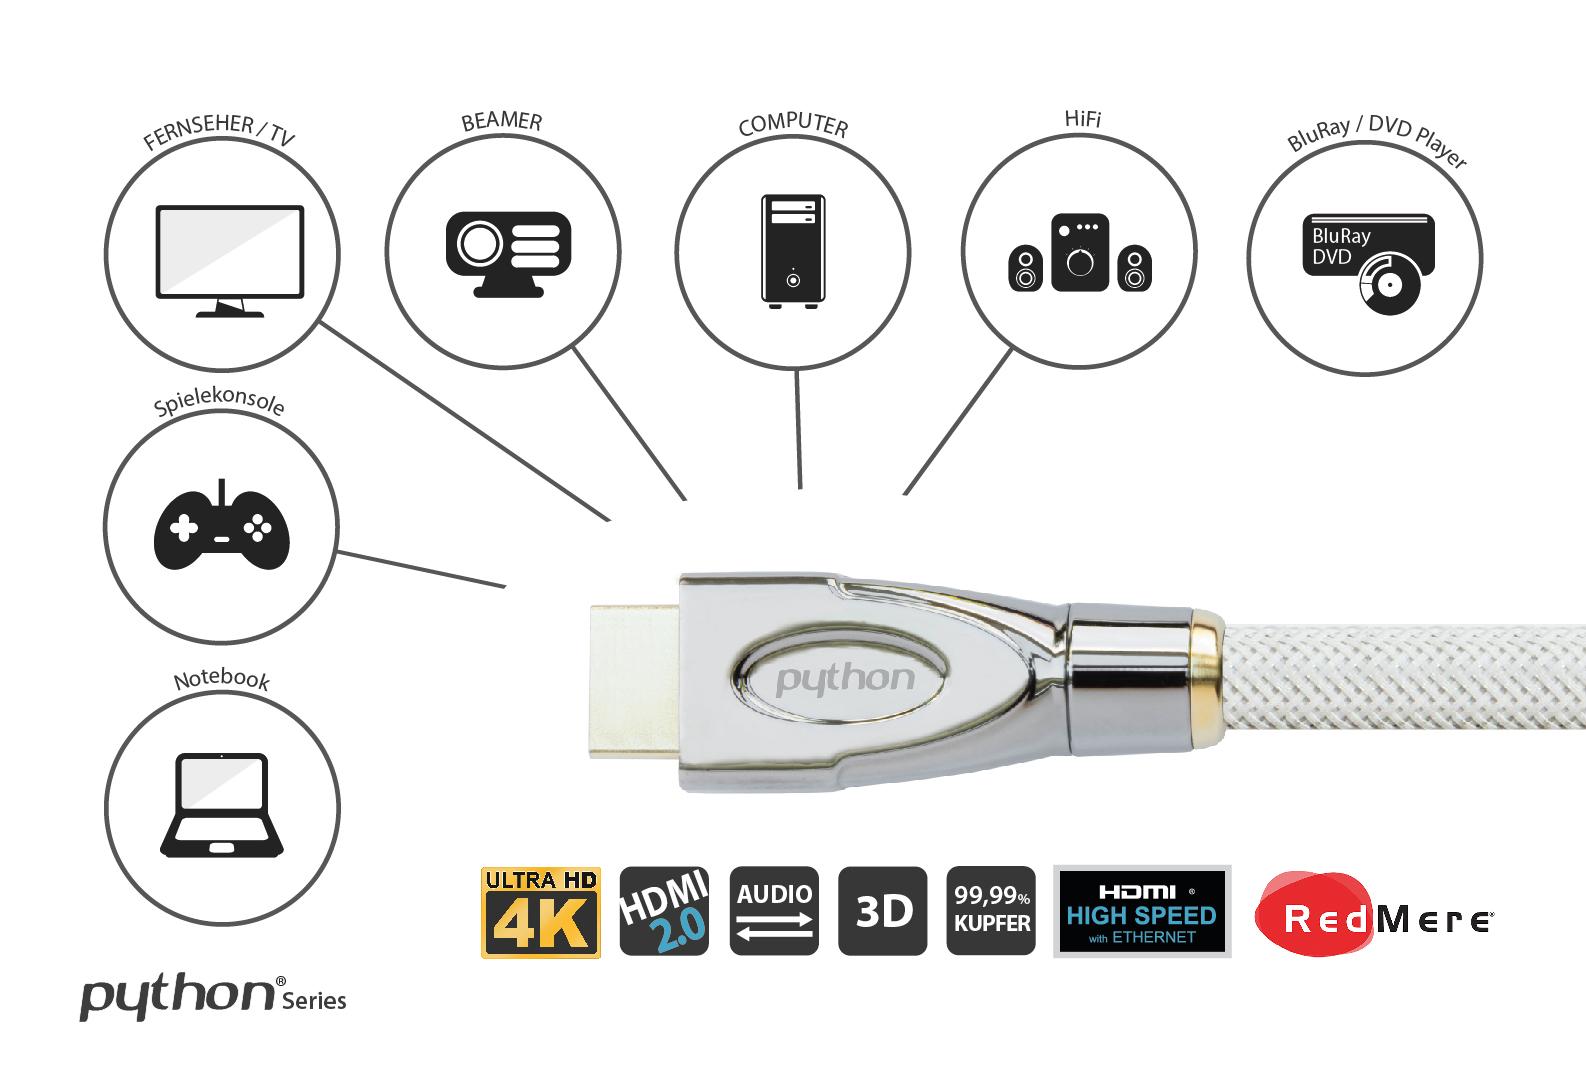 PYTHON® Series Anschlusskabel HDMI® 2.0 Kabel 4K2K / UHD 60Hz, vergoldete Kontakte, OFC, Nylongeflecht weiss, AKTIV, 10m